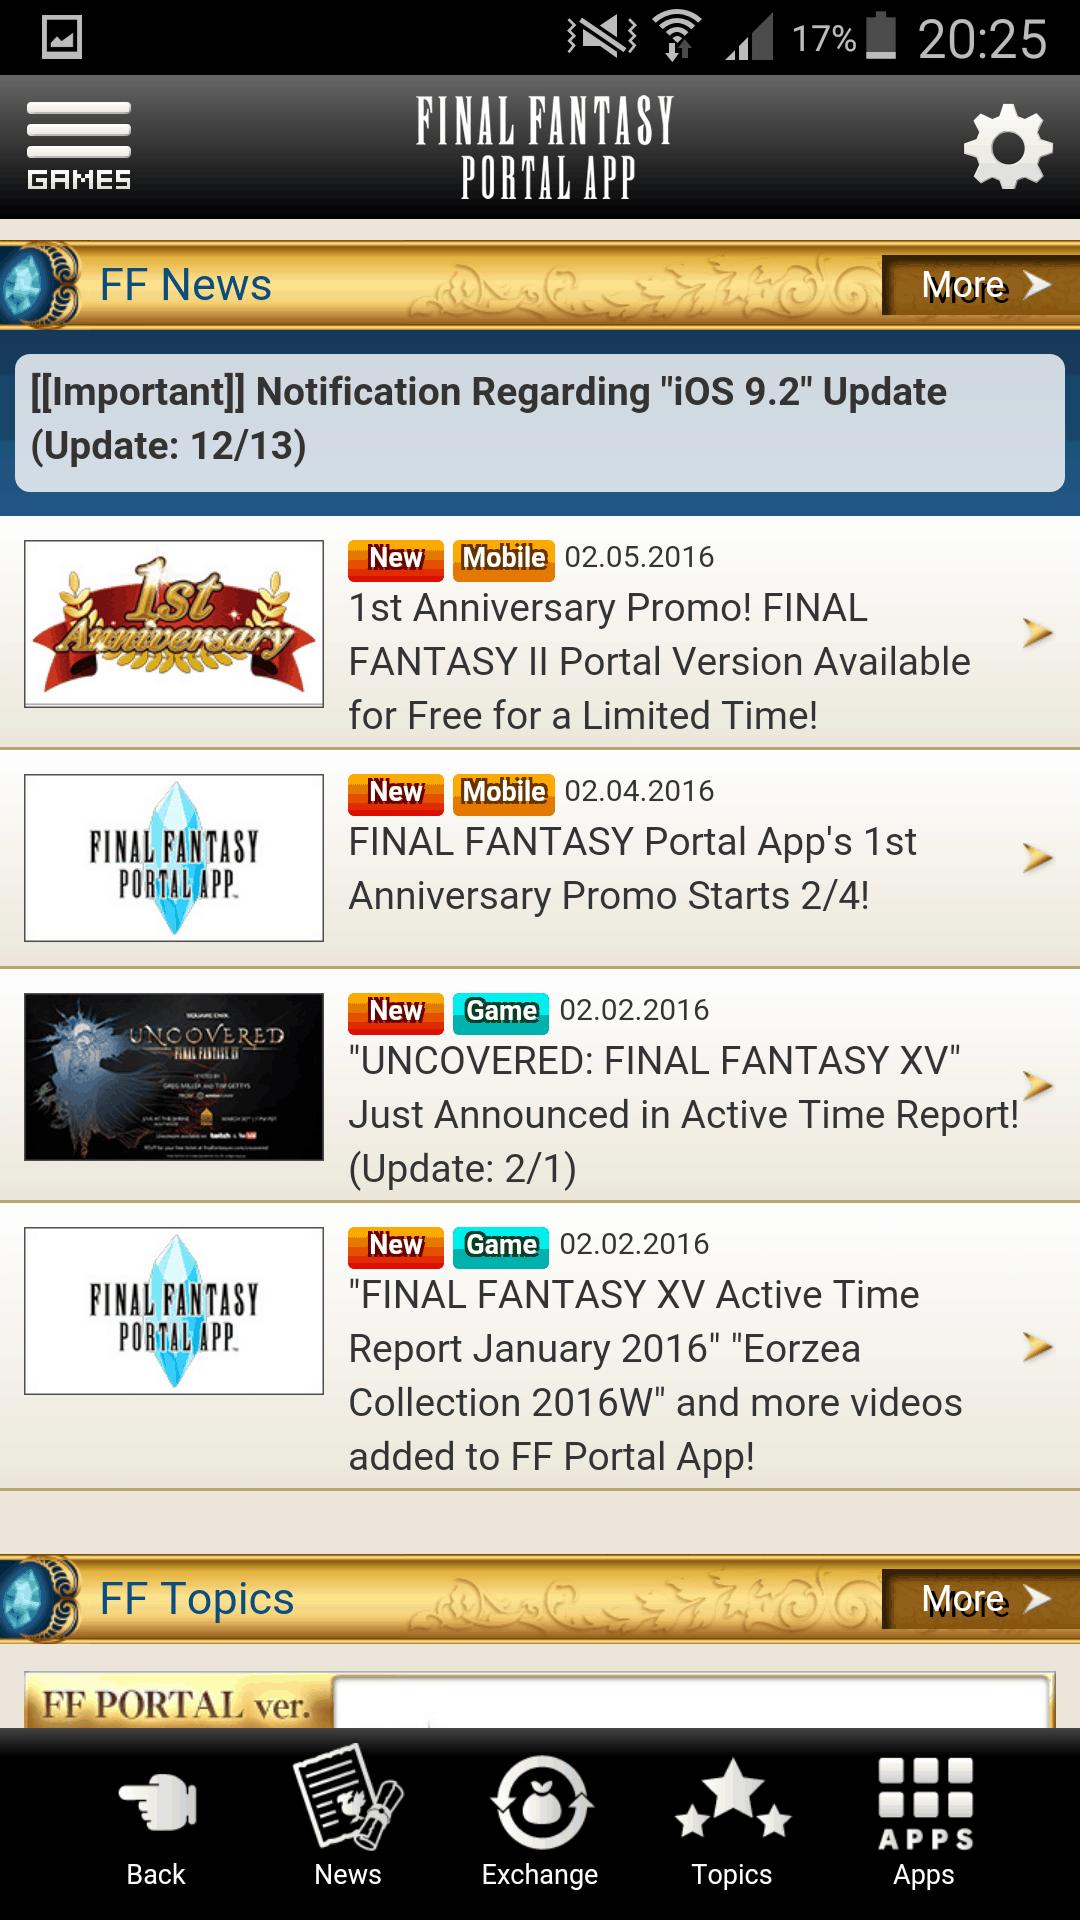 Final Fantasy Portal App Screenshot 1 AH